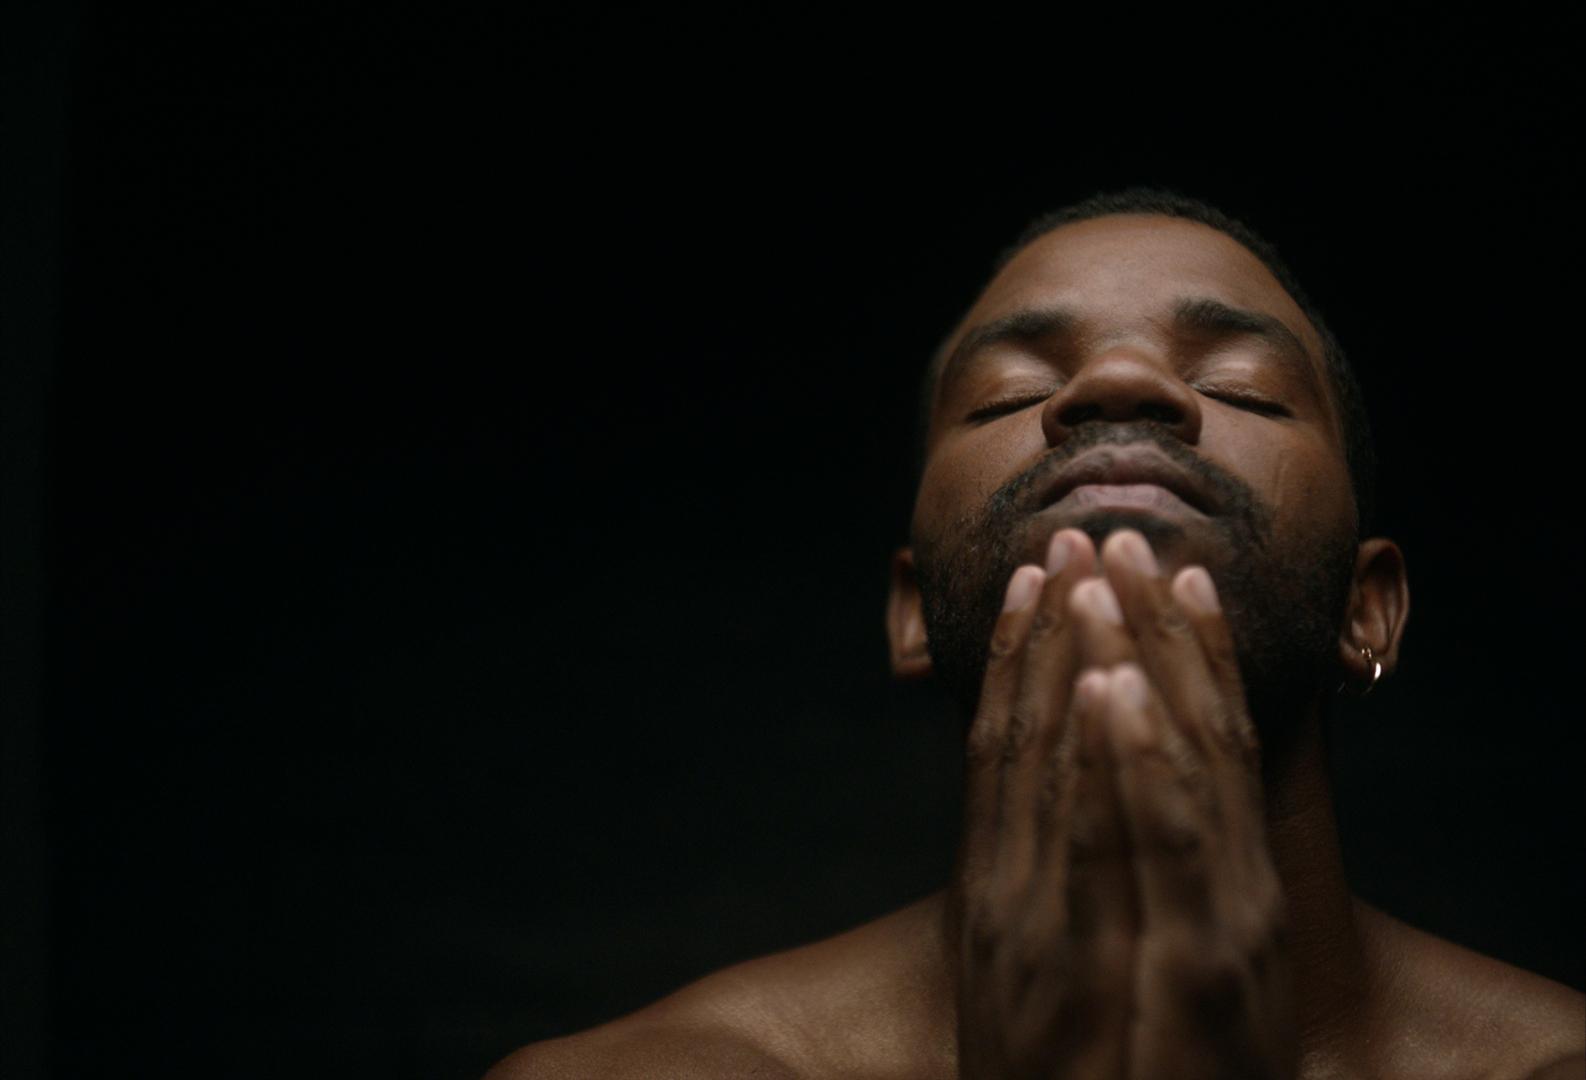 Sojourn_-_Meditative_-_Jonathan_Lewis.jpg